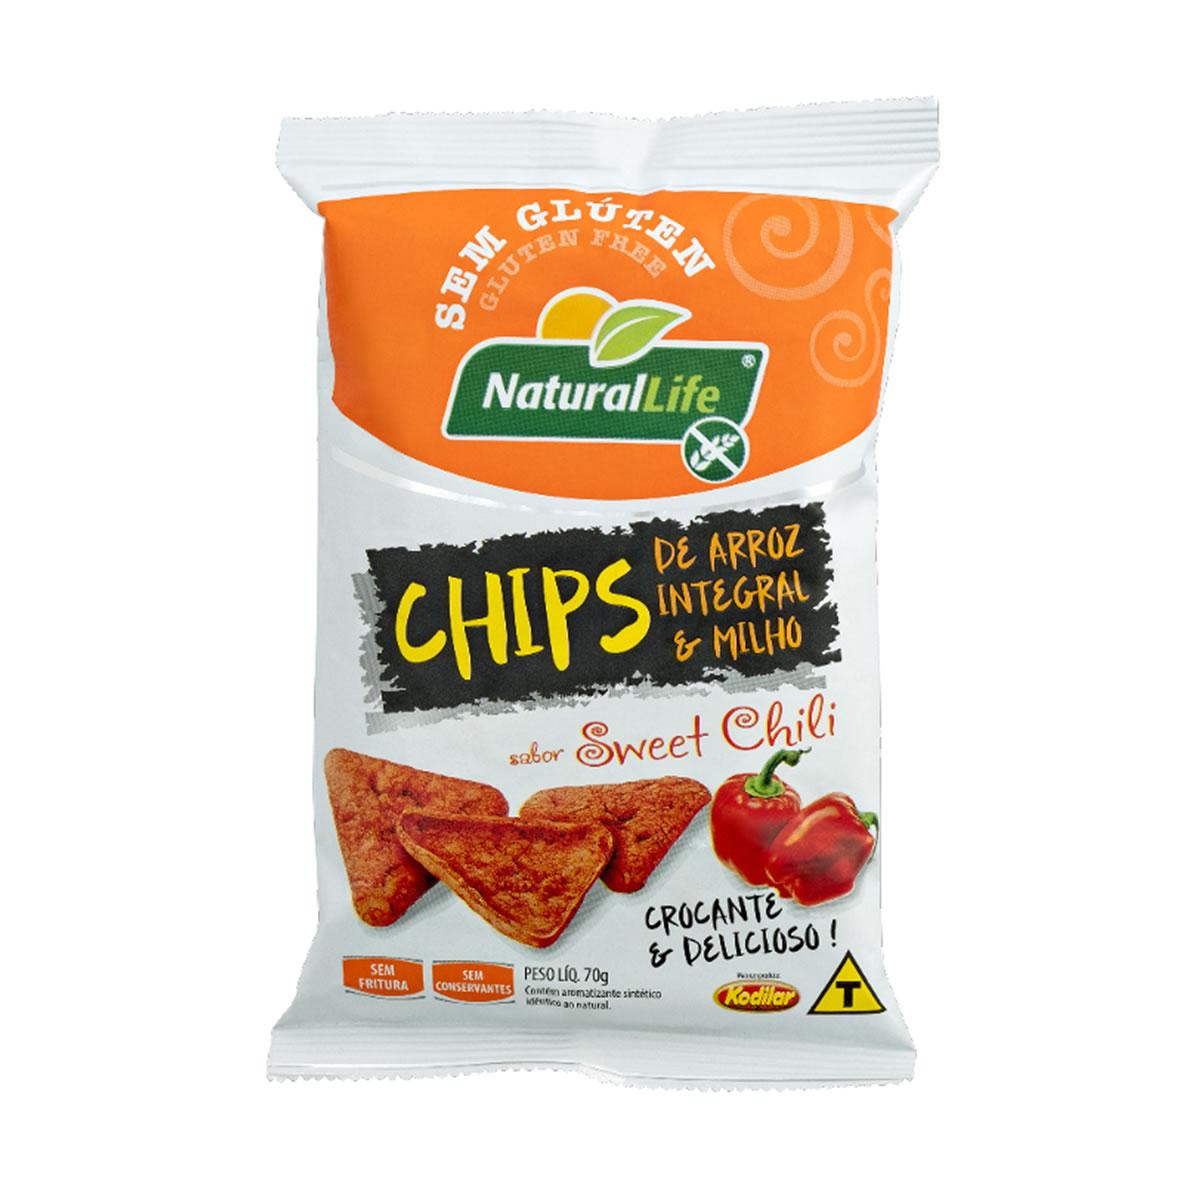 Chips de Arroz Integral e Milho Sabor Sweet Chili Sem Glúten 70g - NaturalLife